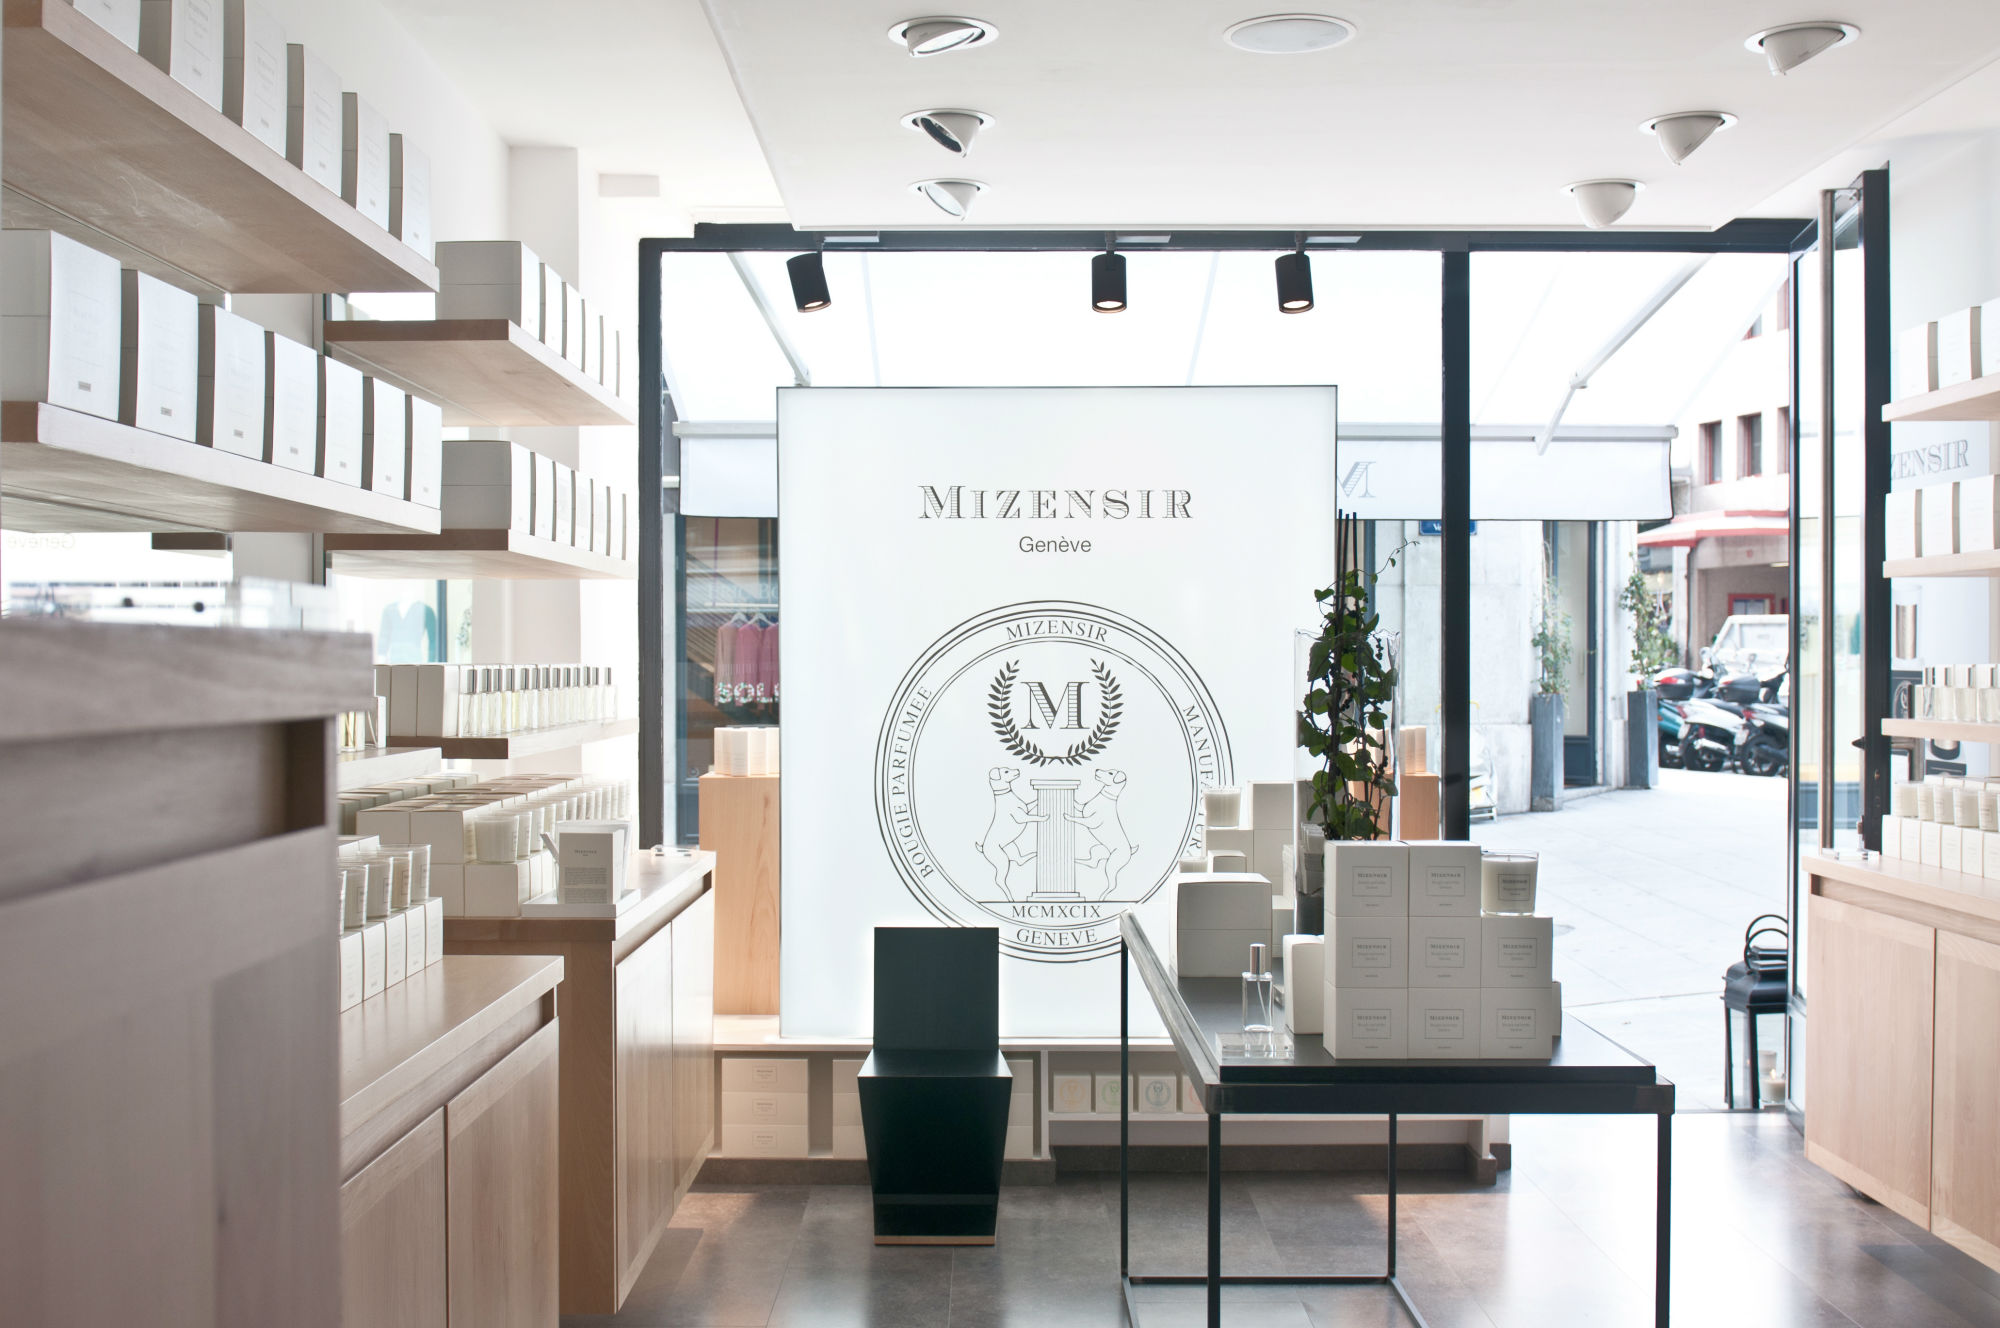 Mizensir began as a home fragrance brand in 1999